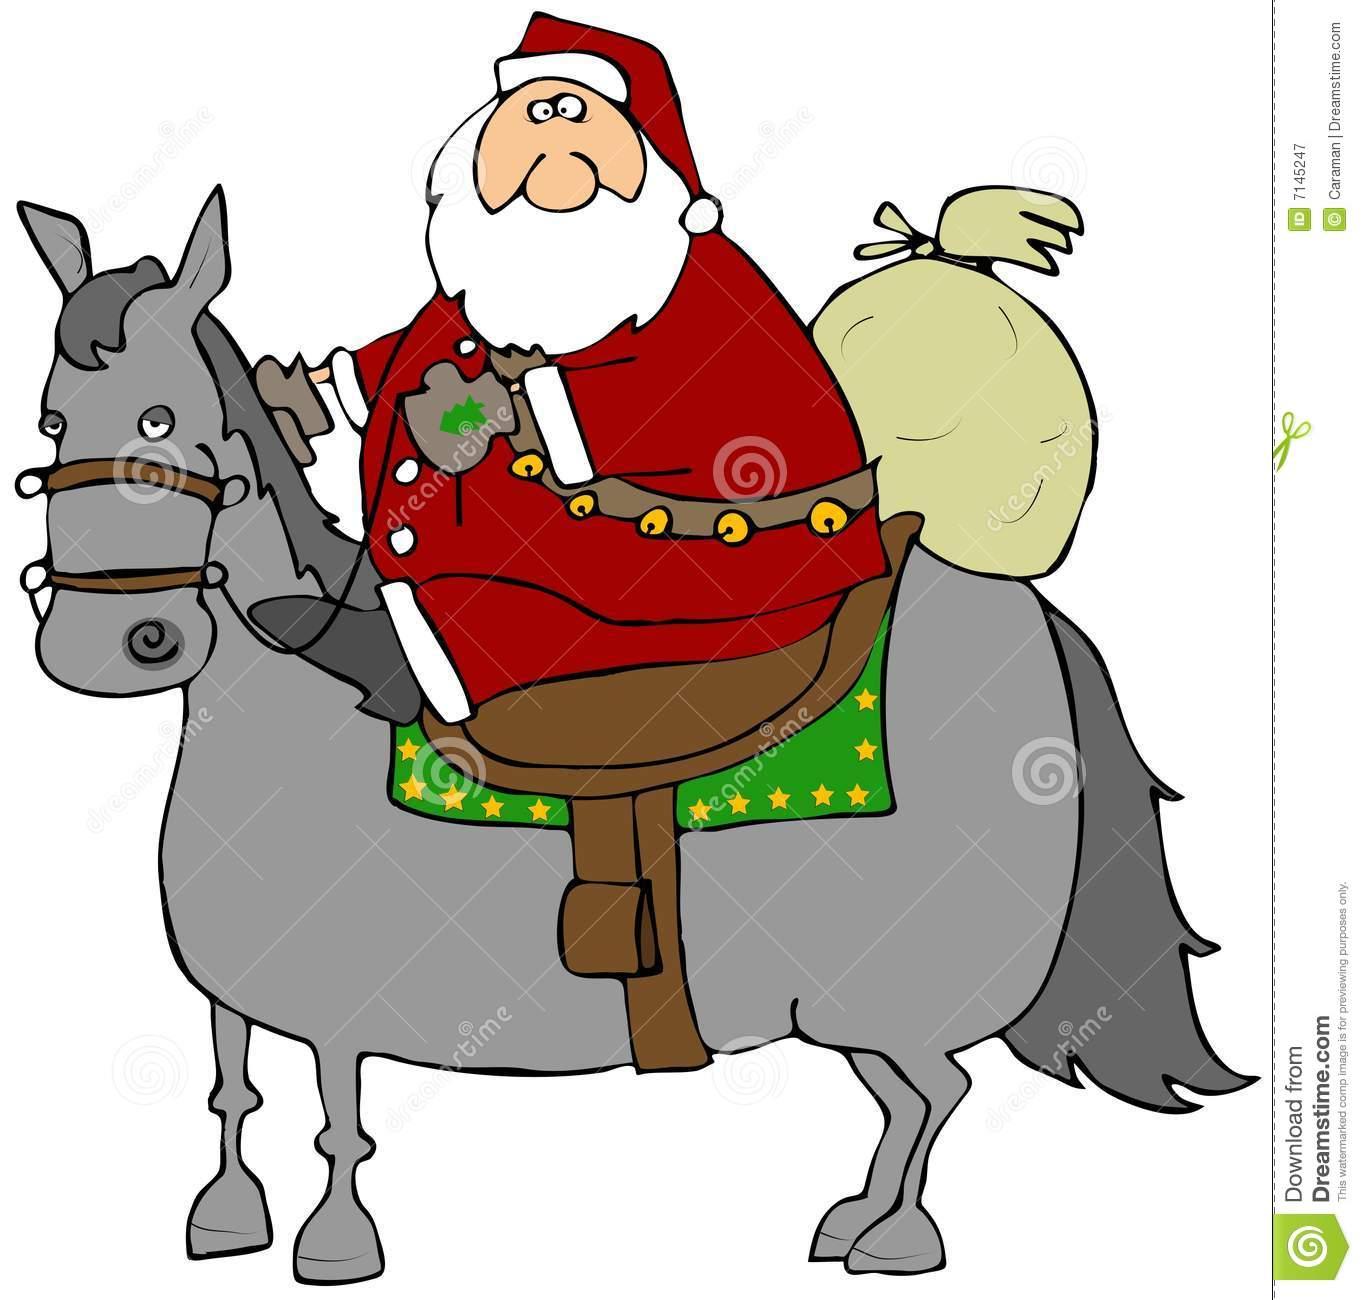 Santa Riding A Horse stock illustration. Illustration of christmas.